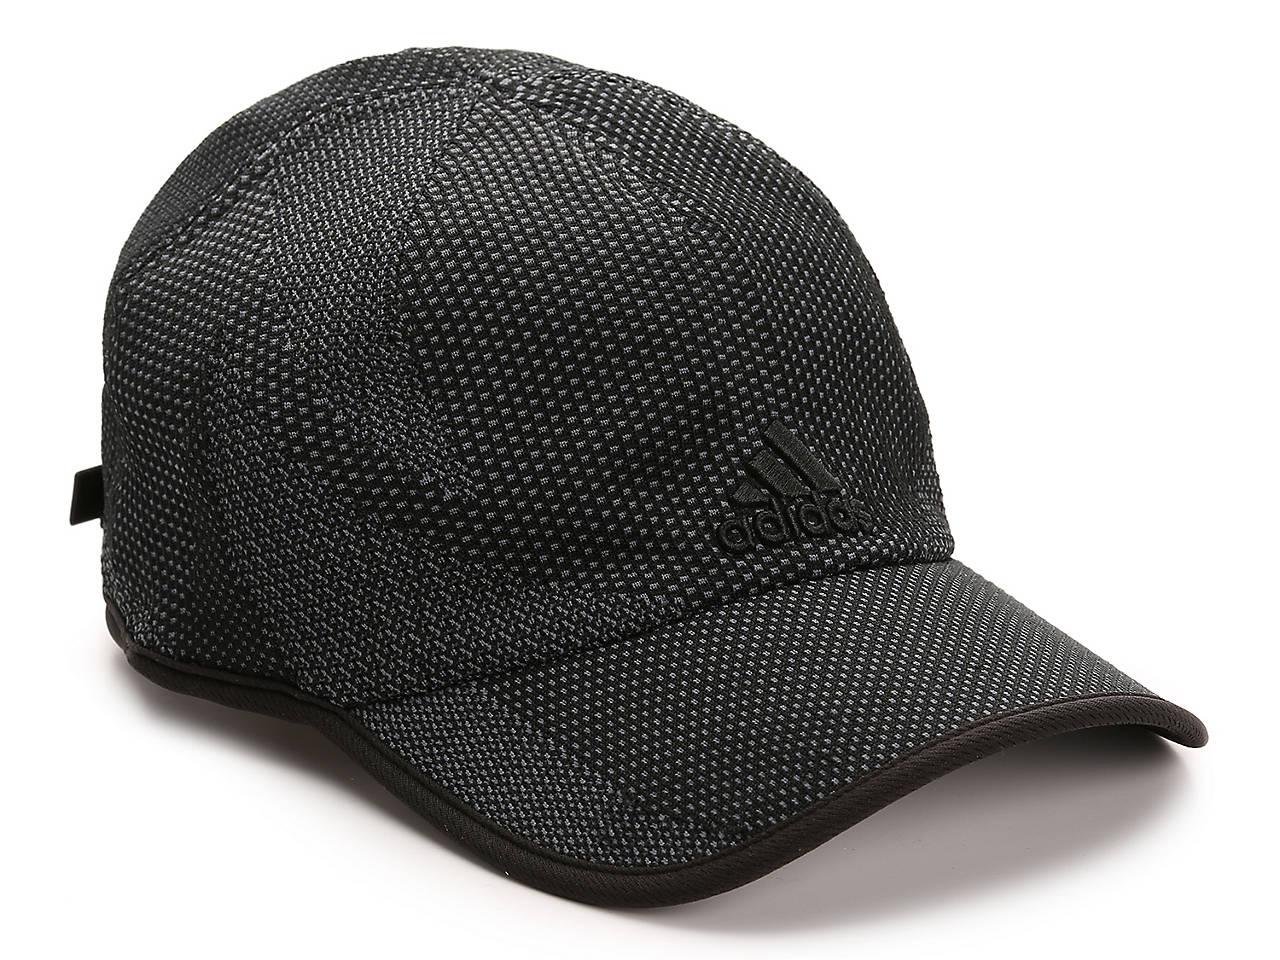 adidas Superlite Prime Baseball Cap Men s Handbags   Accessories  d30f4f42930